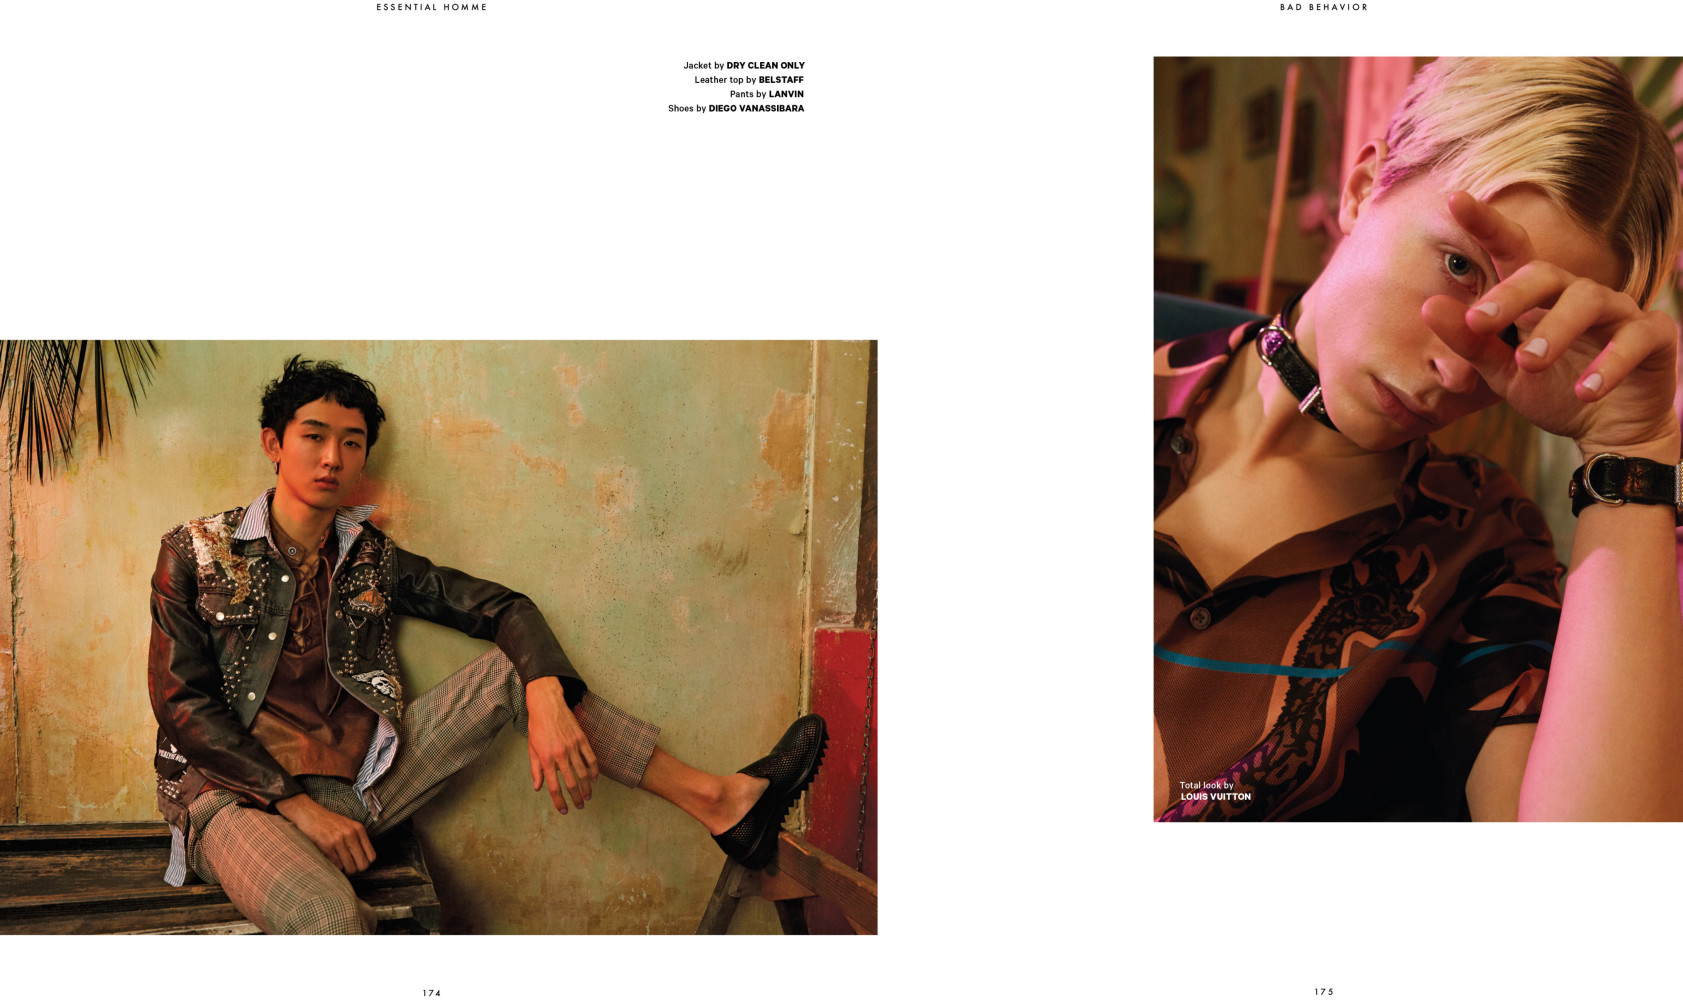 Dan & Tsubasa For Essentiel Homme Magazine